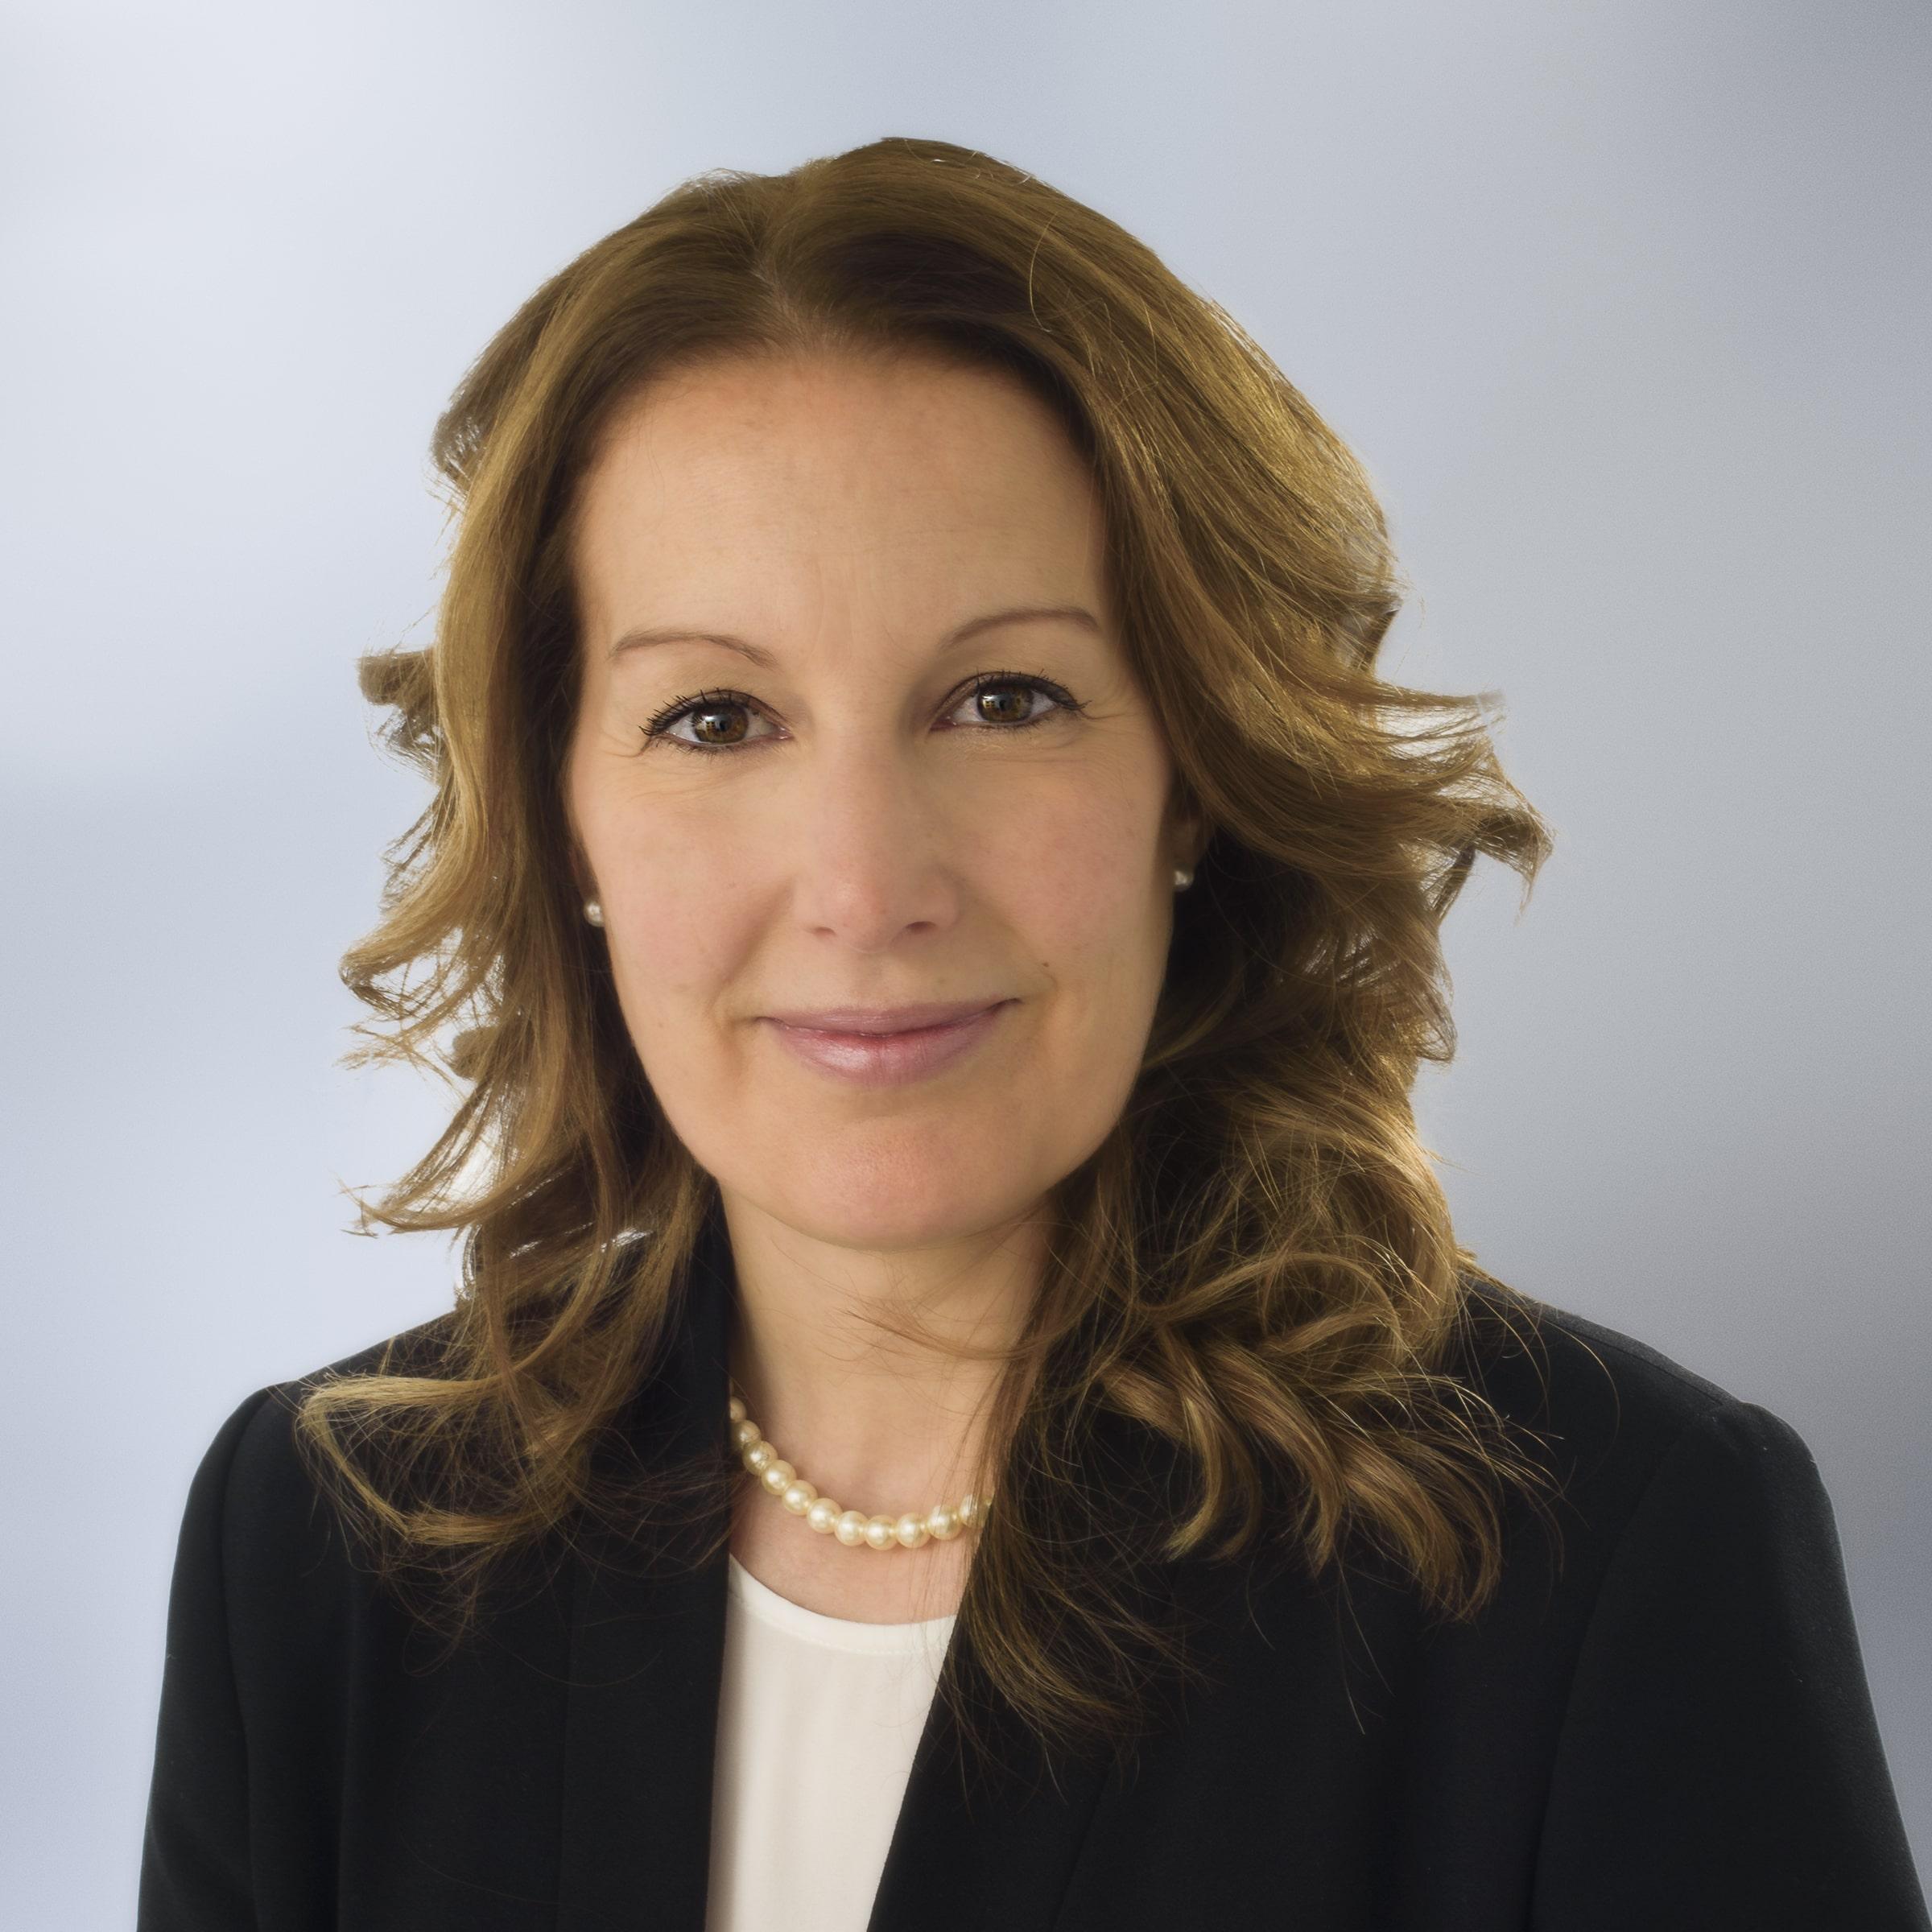 Valérie Ménard, Vice-Présidente